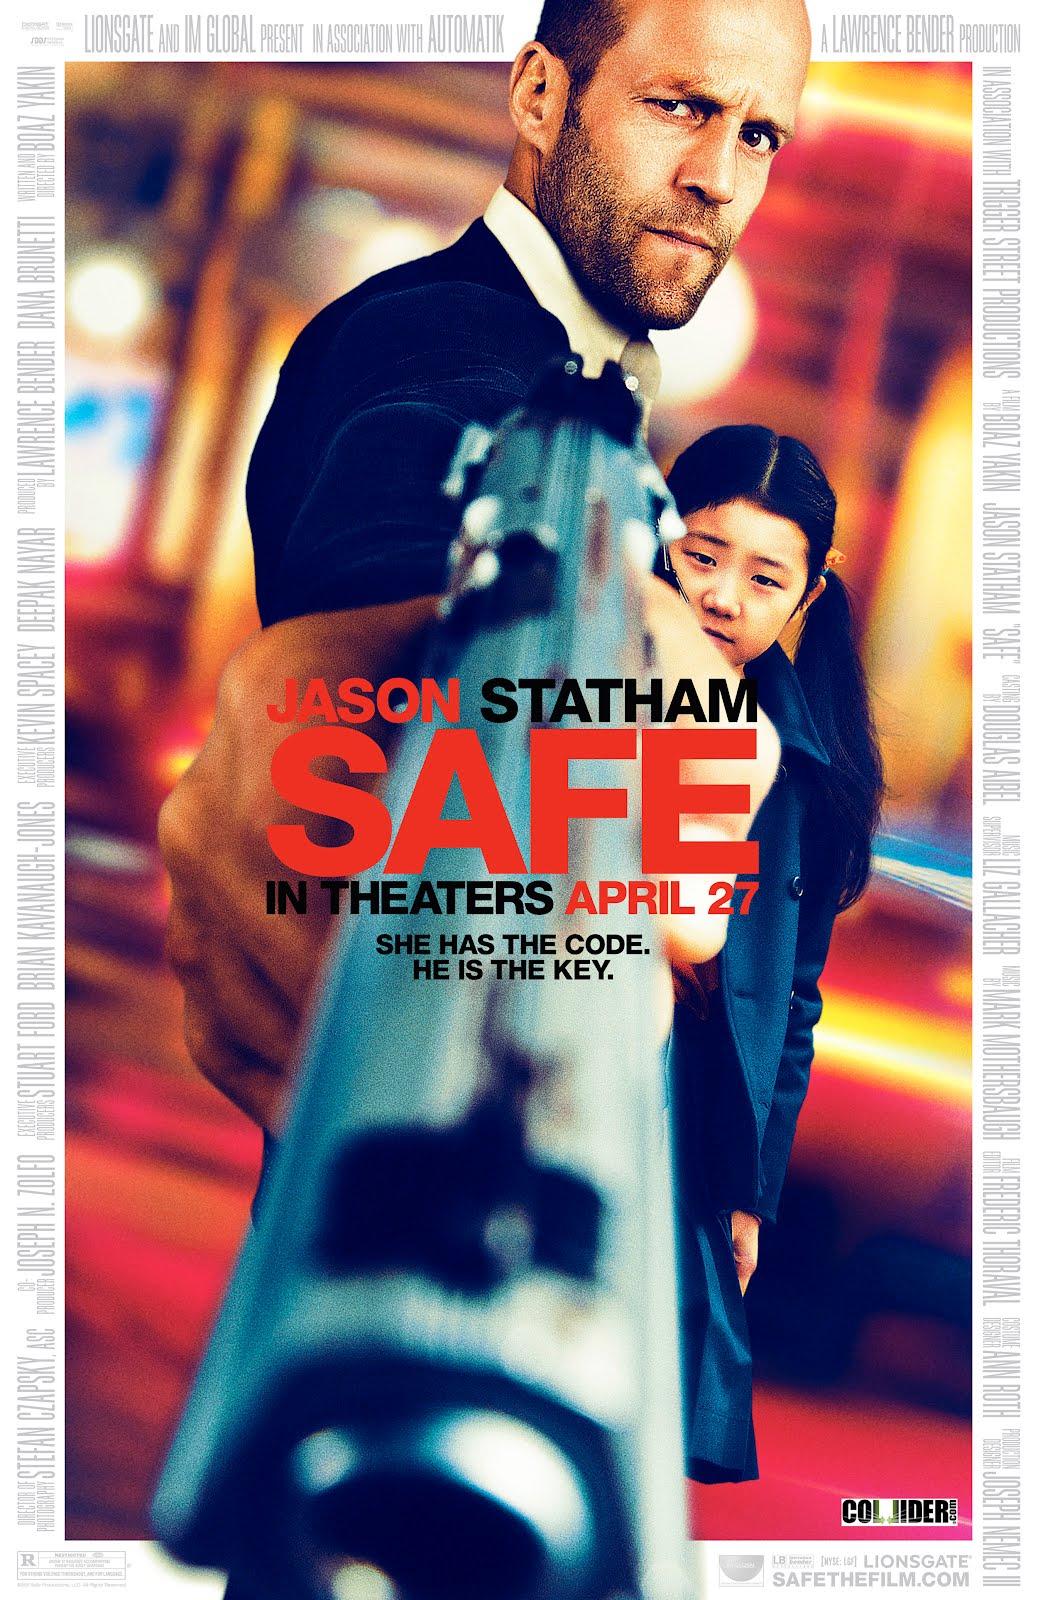 http://4.bp.blogspot.com/-4dBJLo3hQjs/T5YrXYYmdnI/AAAAAAAABhc/OSTtGvOG7ys/s1600/Safe-movie-poster-Jason-Statham.jpg